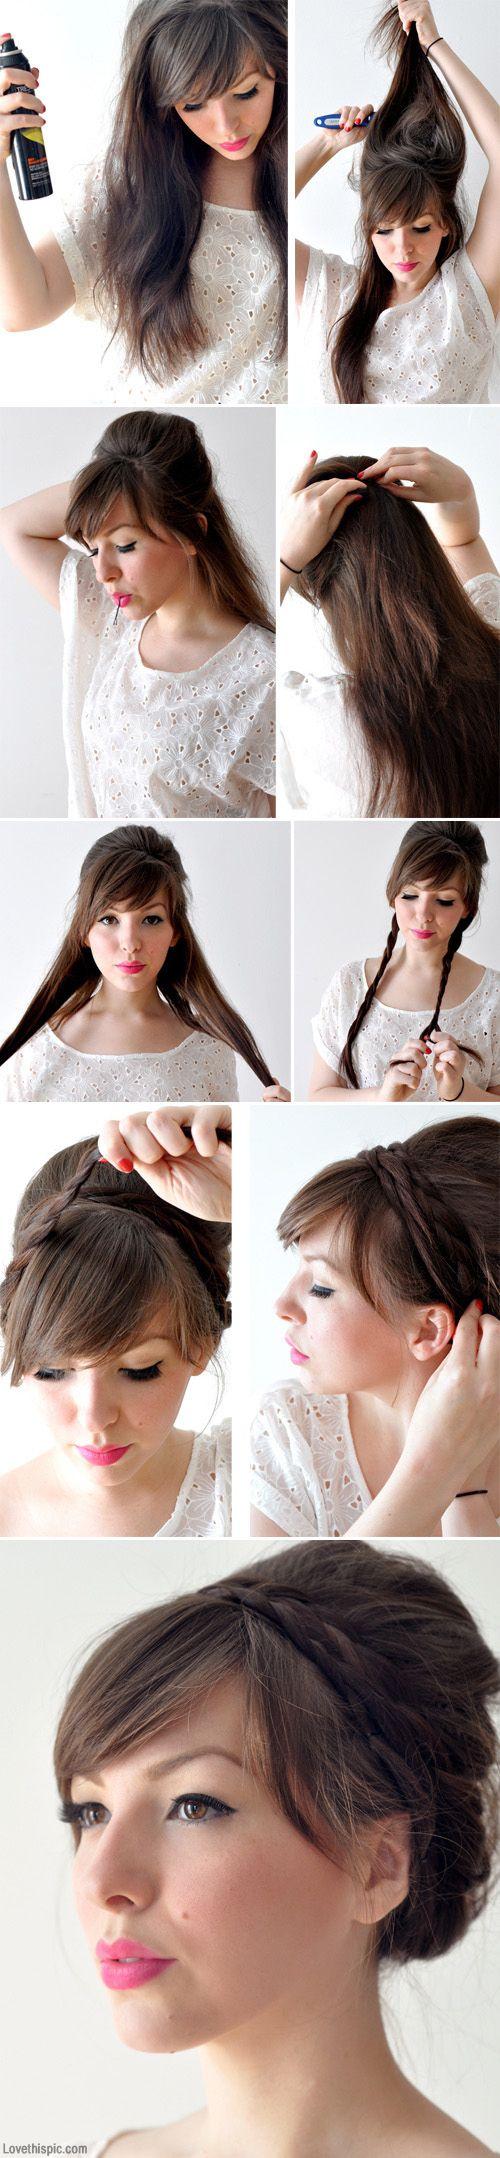 Diy Style Braids diy diy crafts do it yourself diy art diy tips dig ideas diy photo diy picture diy photography